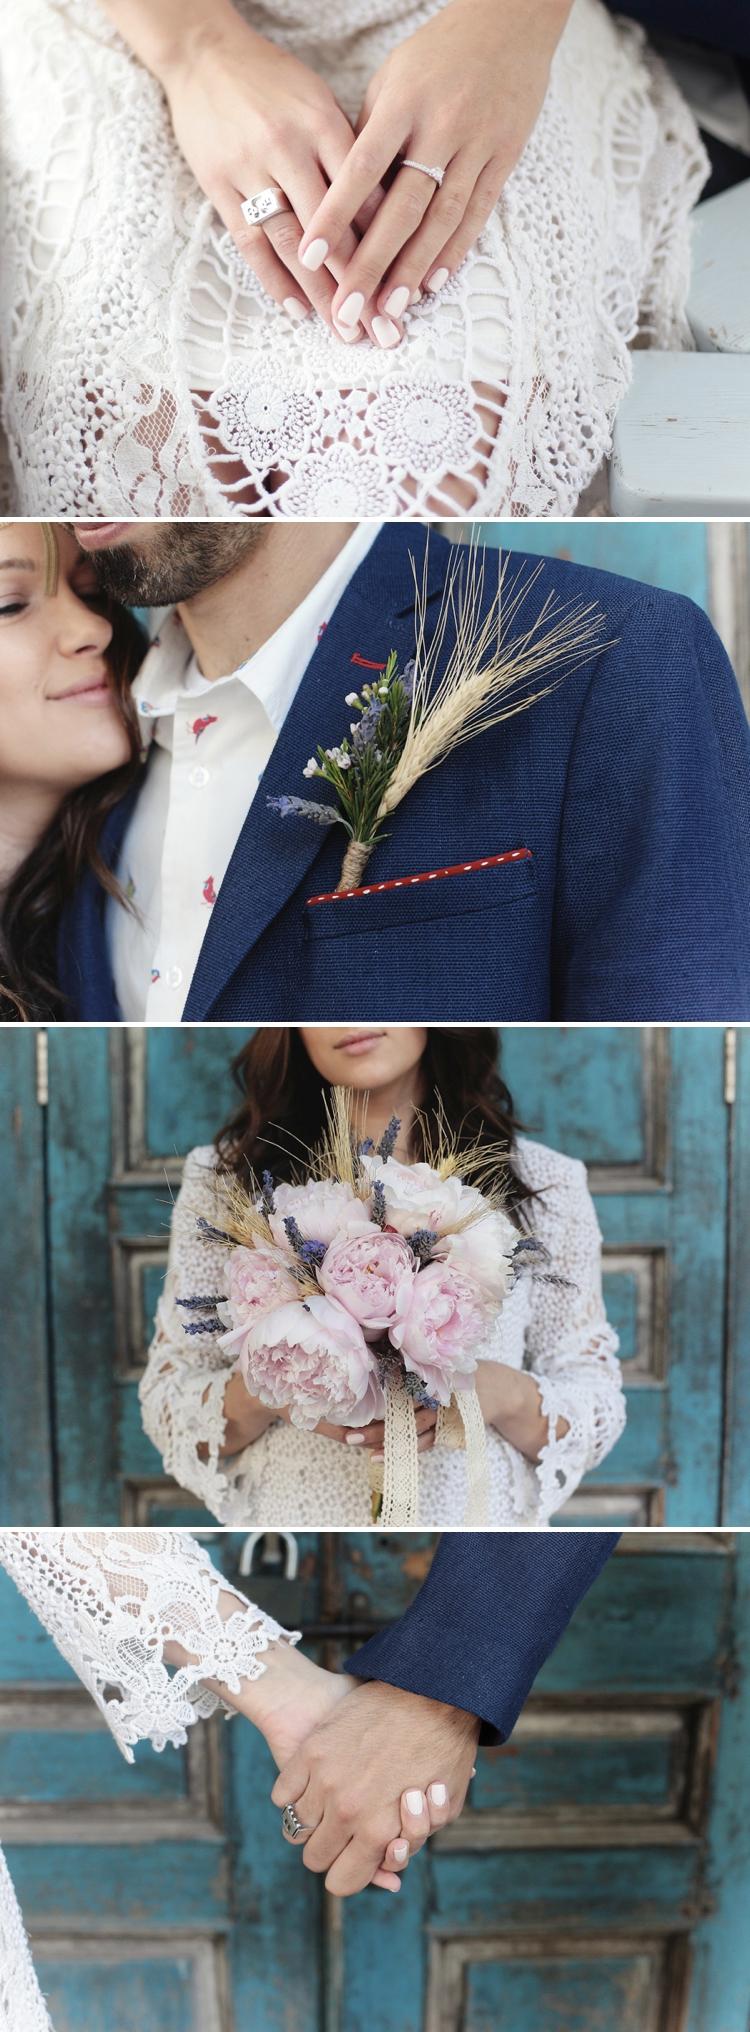 Hand-crafted, rustic, bohemian 'Instagram' Israeli wedding at Duce Villa, Tel Aviv